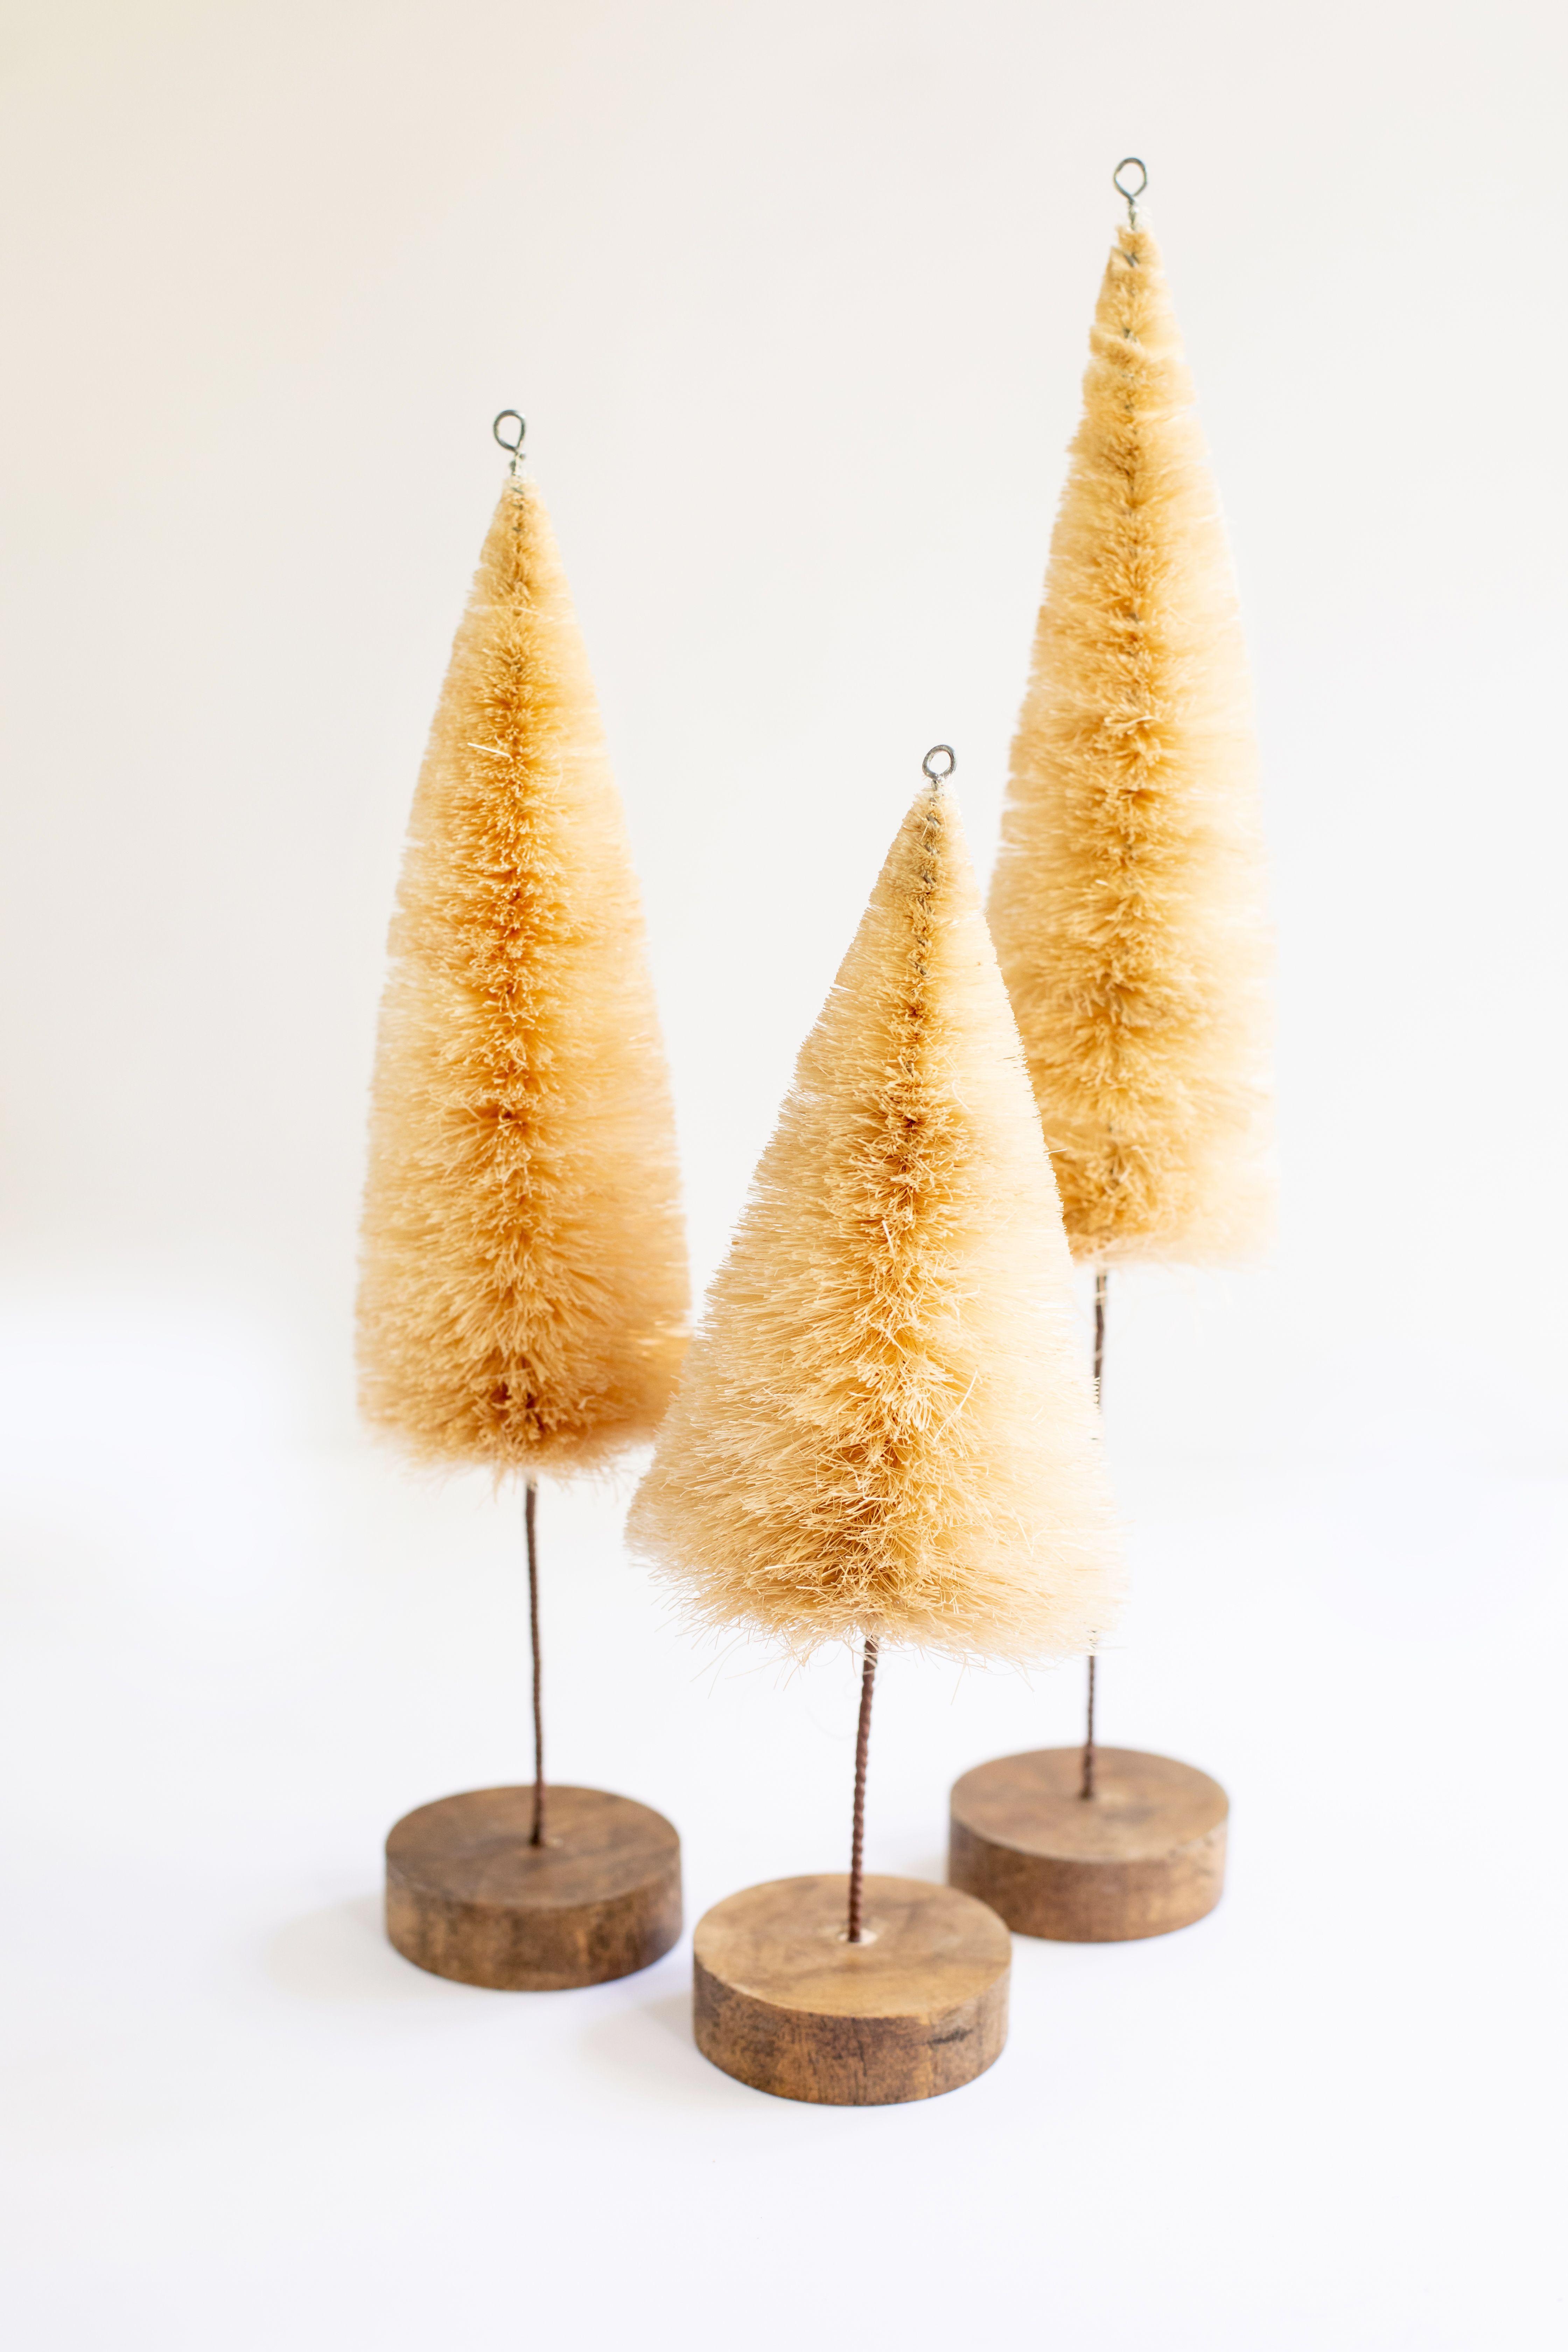 Bottle Brush Christmas Tree Set Christmas Tree Set Bottle Brush Christmas Trees Bottle Brush